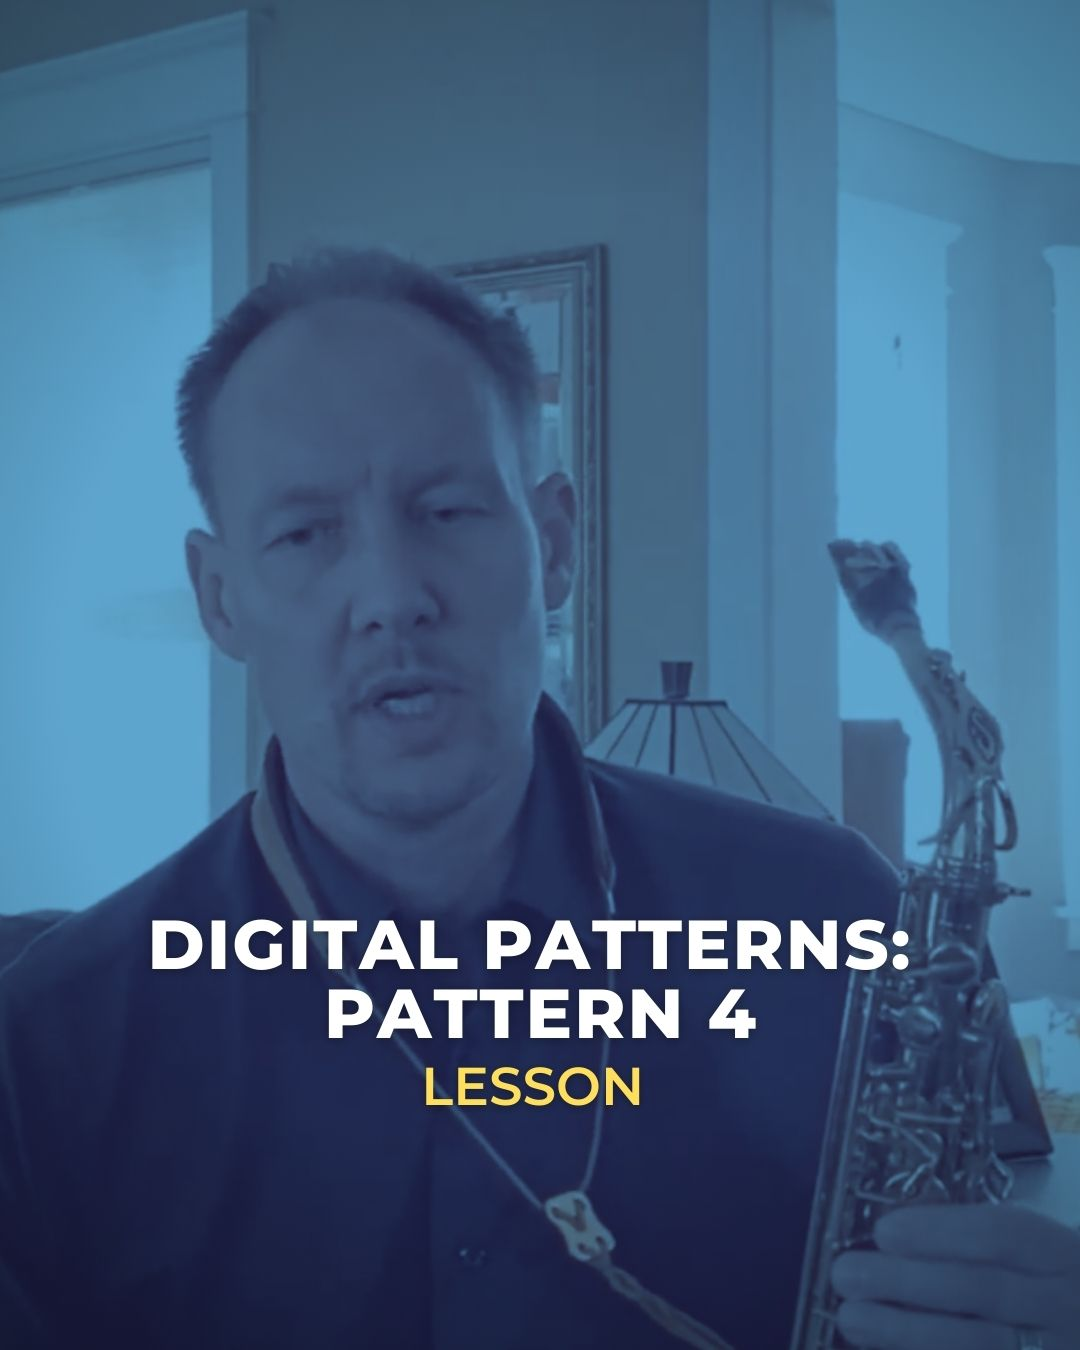 Digital Pattern 4